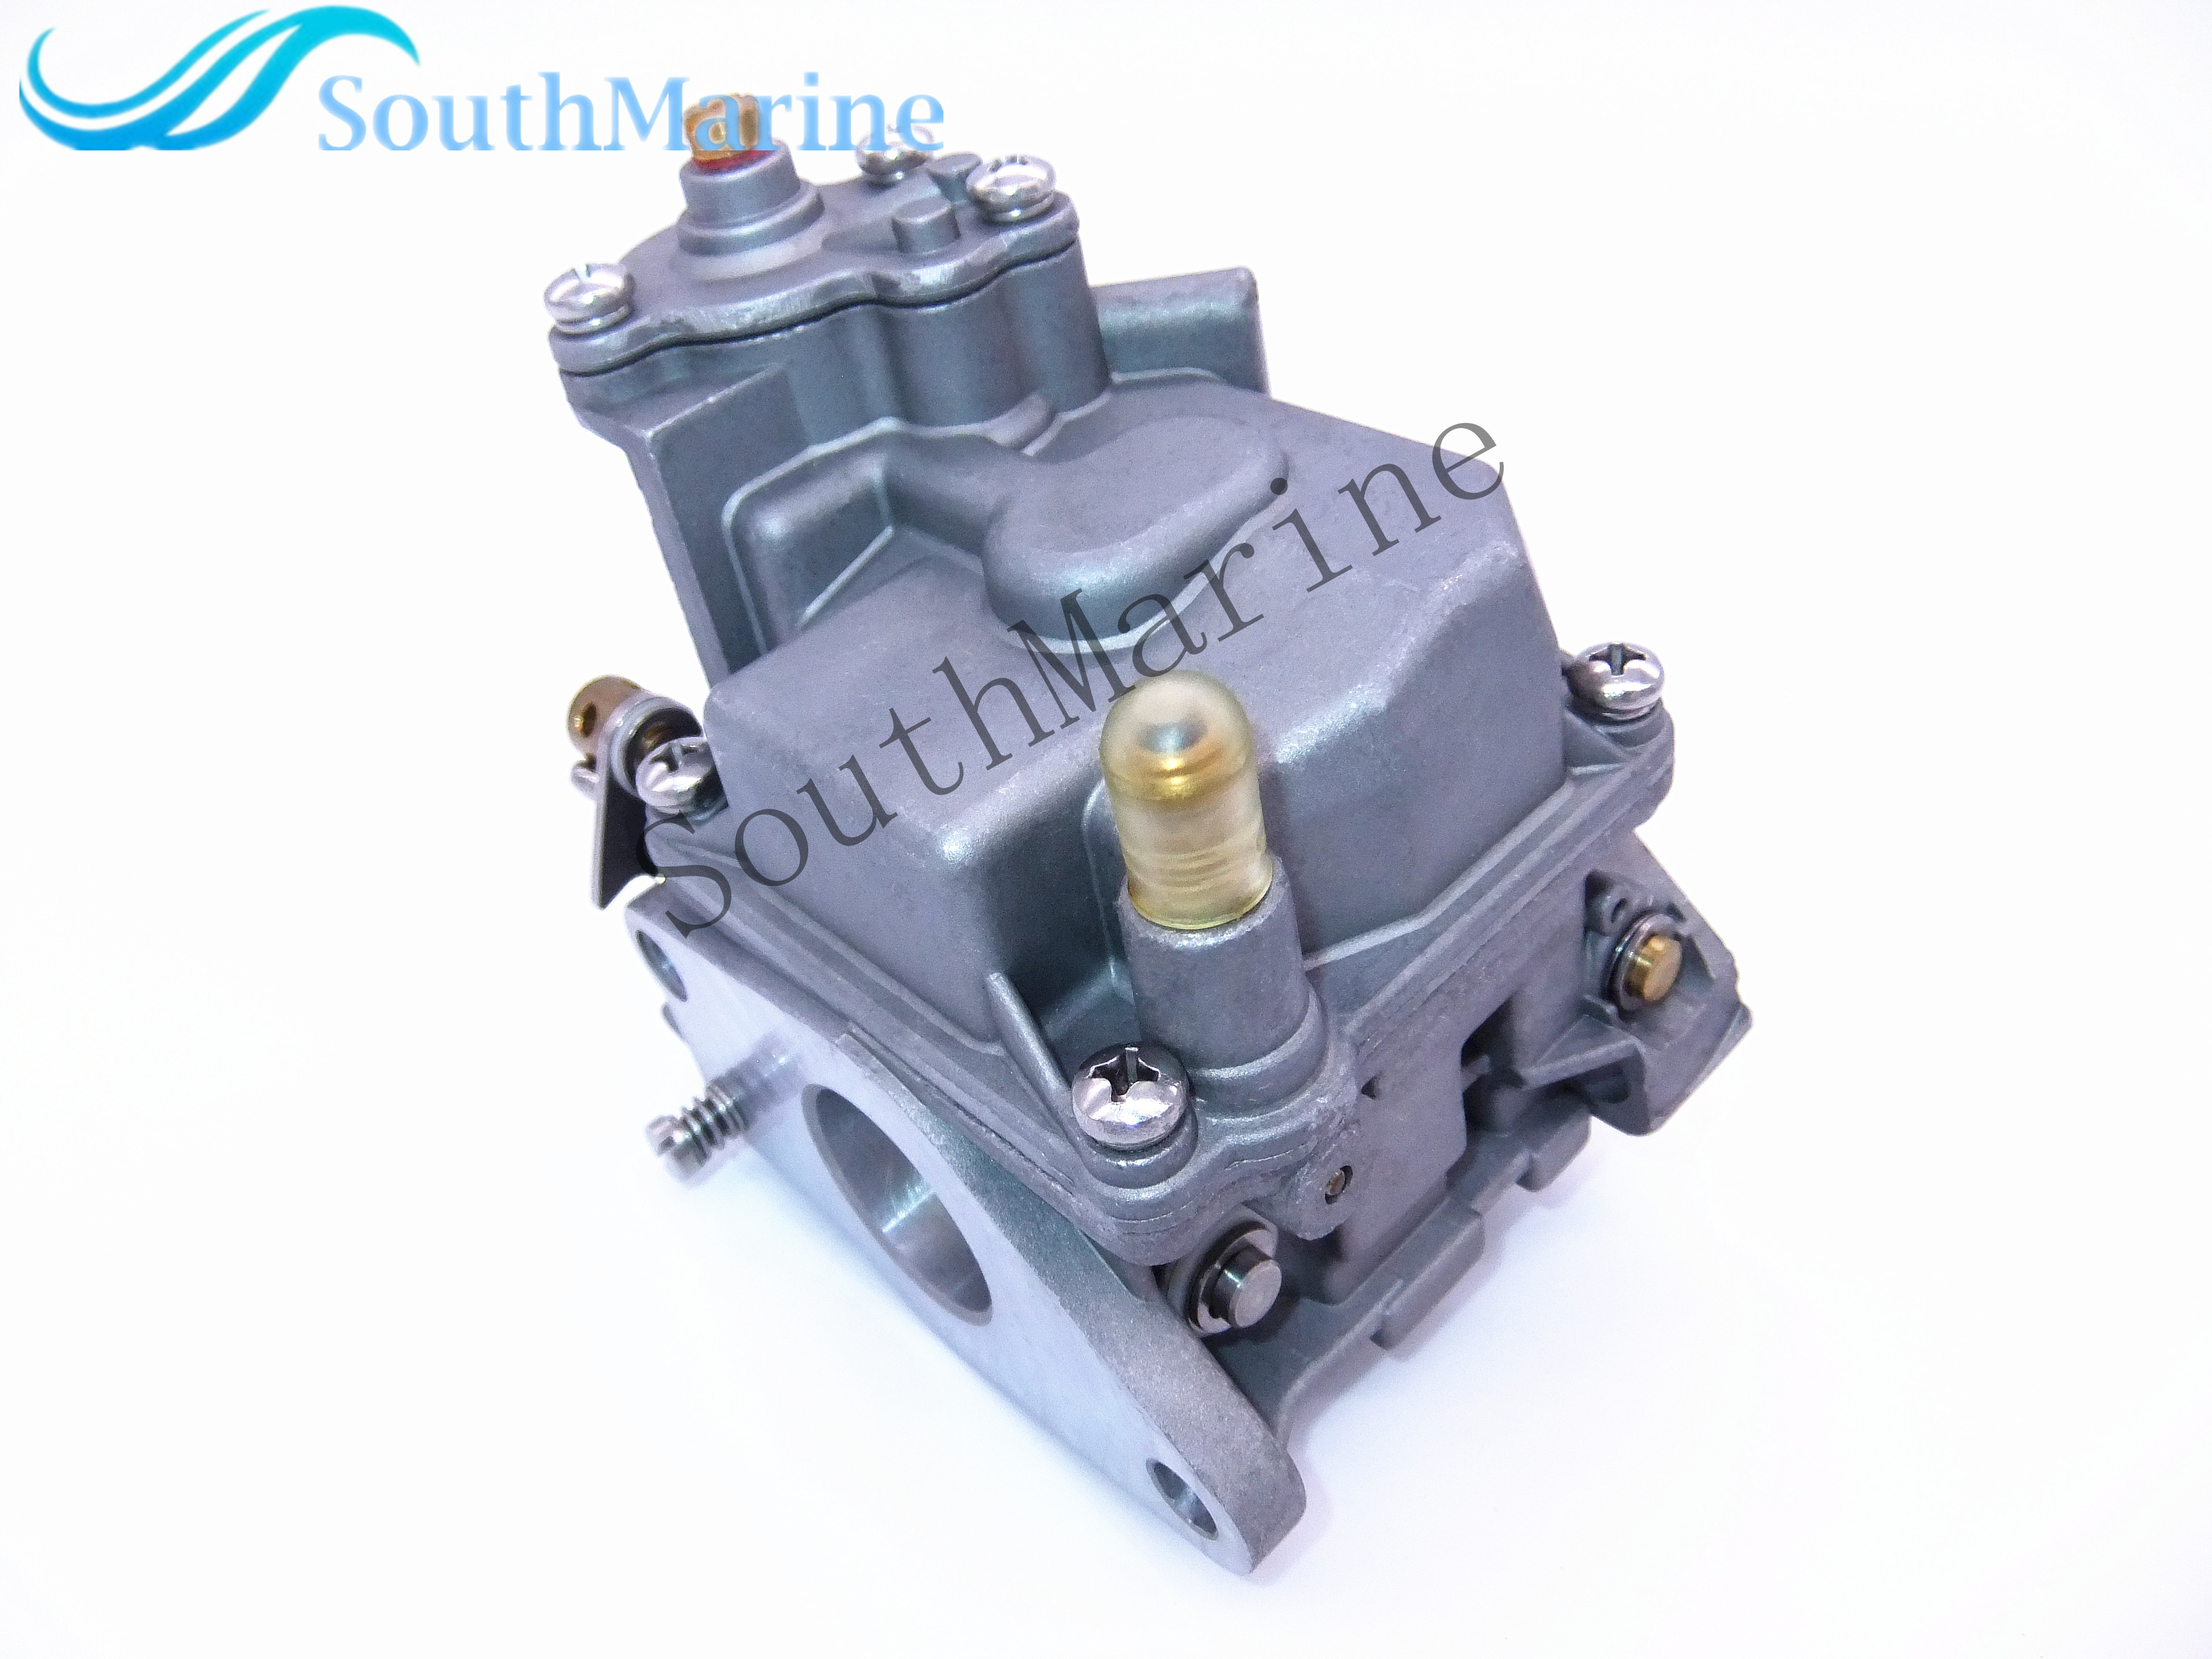 Boat Motor Carburetor Carb F15-07090000 For Parsun HDX Makara F9.9BM F9.9FM F15BM F15FM 4-stroke Outboard Engine, Manual Start